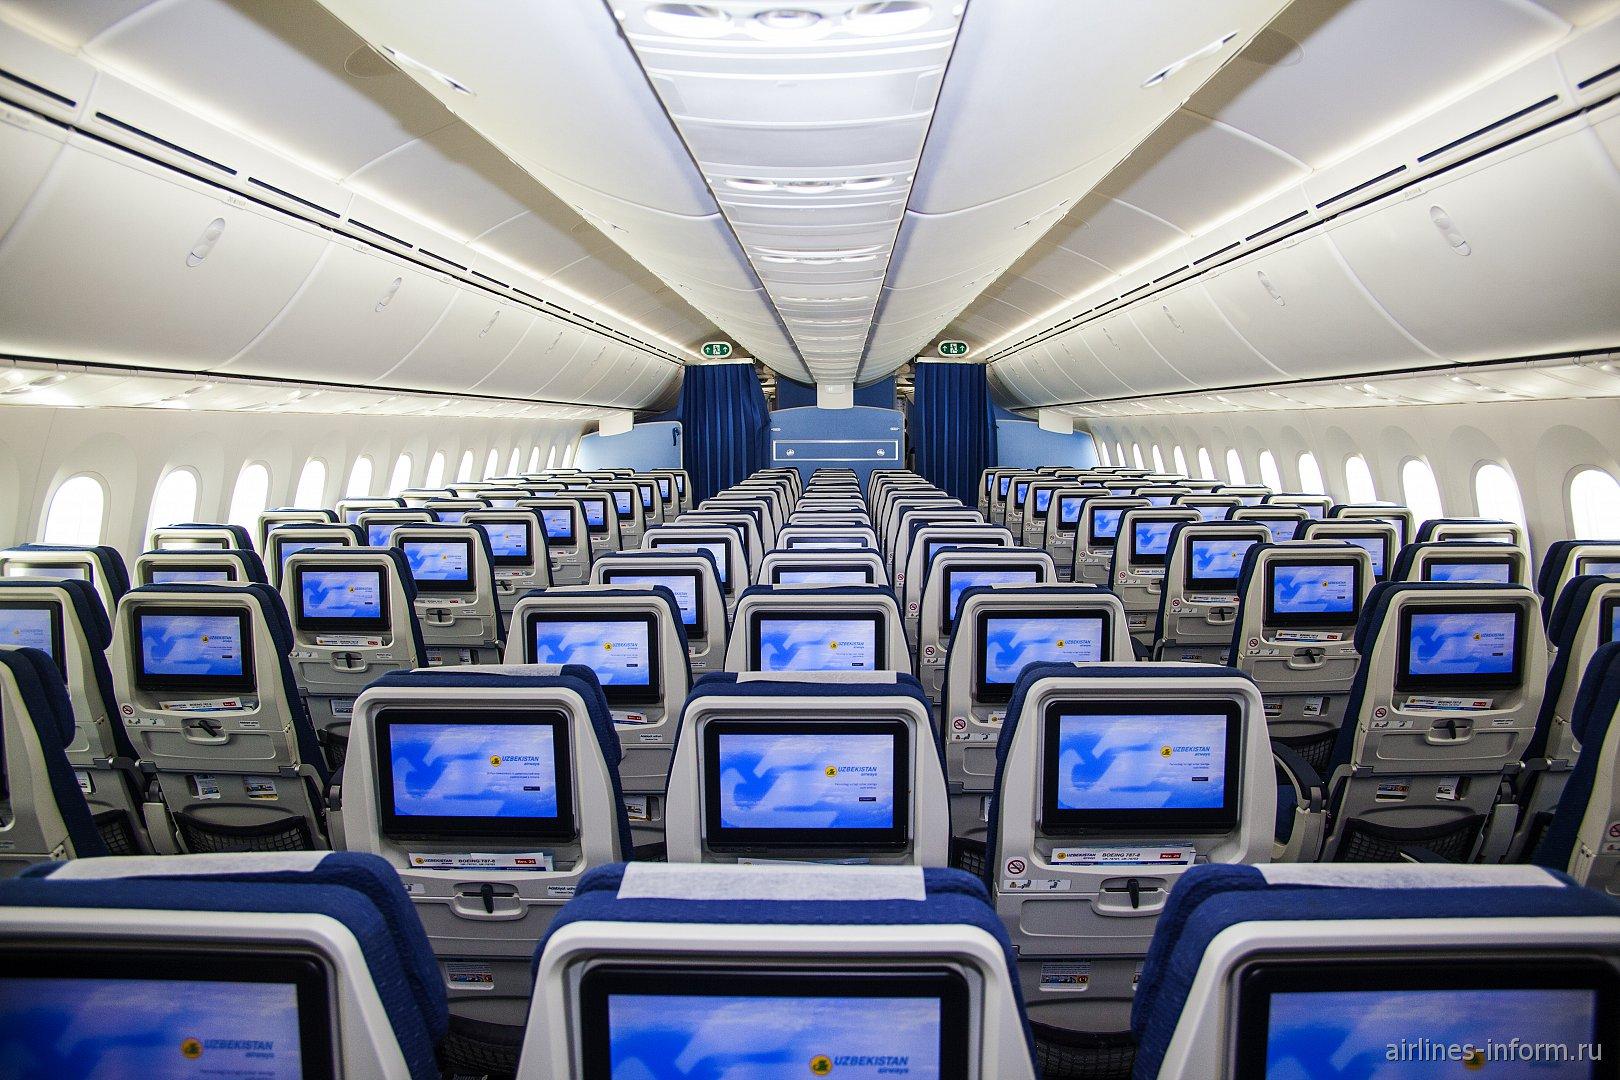 Пассажирский салон самолета Boeing-787-8 Dreamliner Узбекских авиалиний